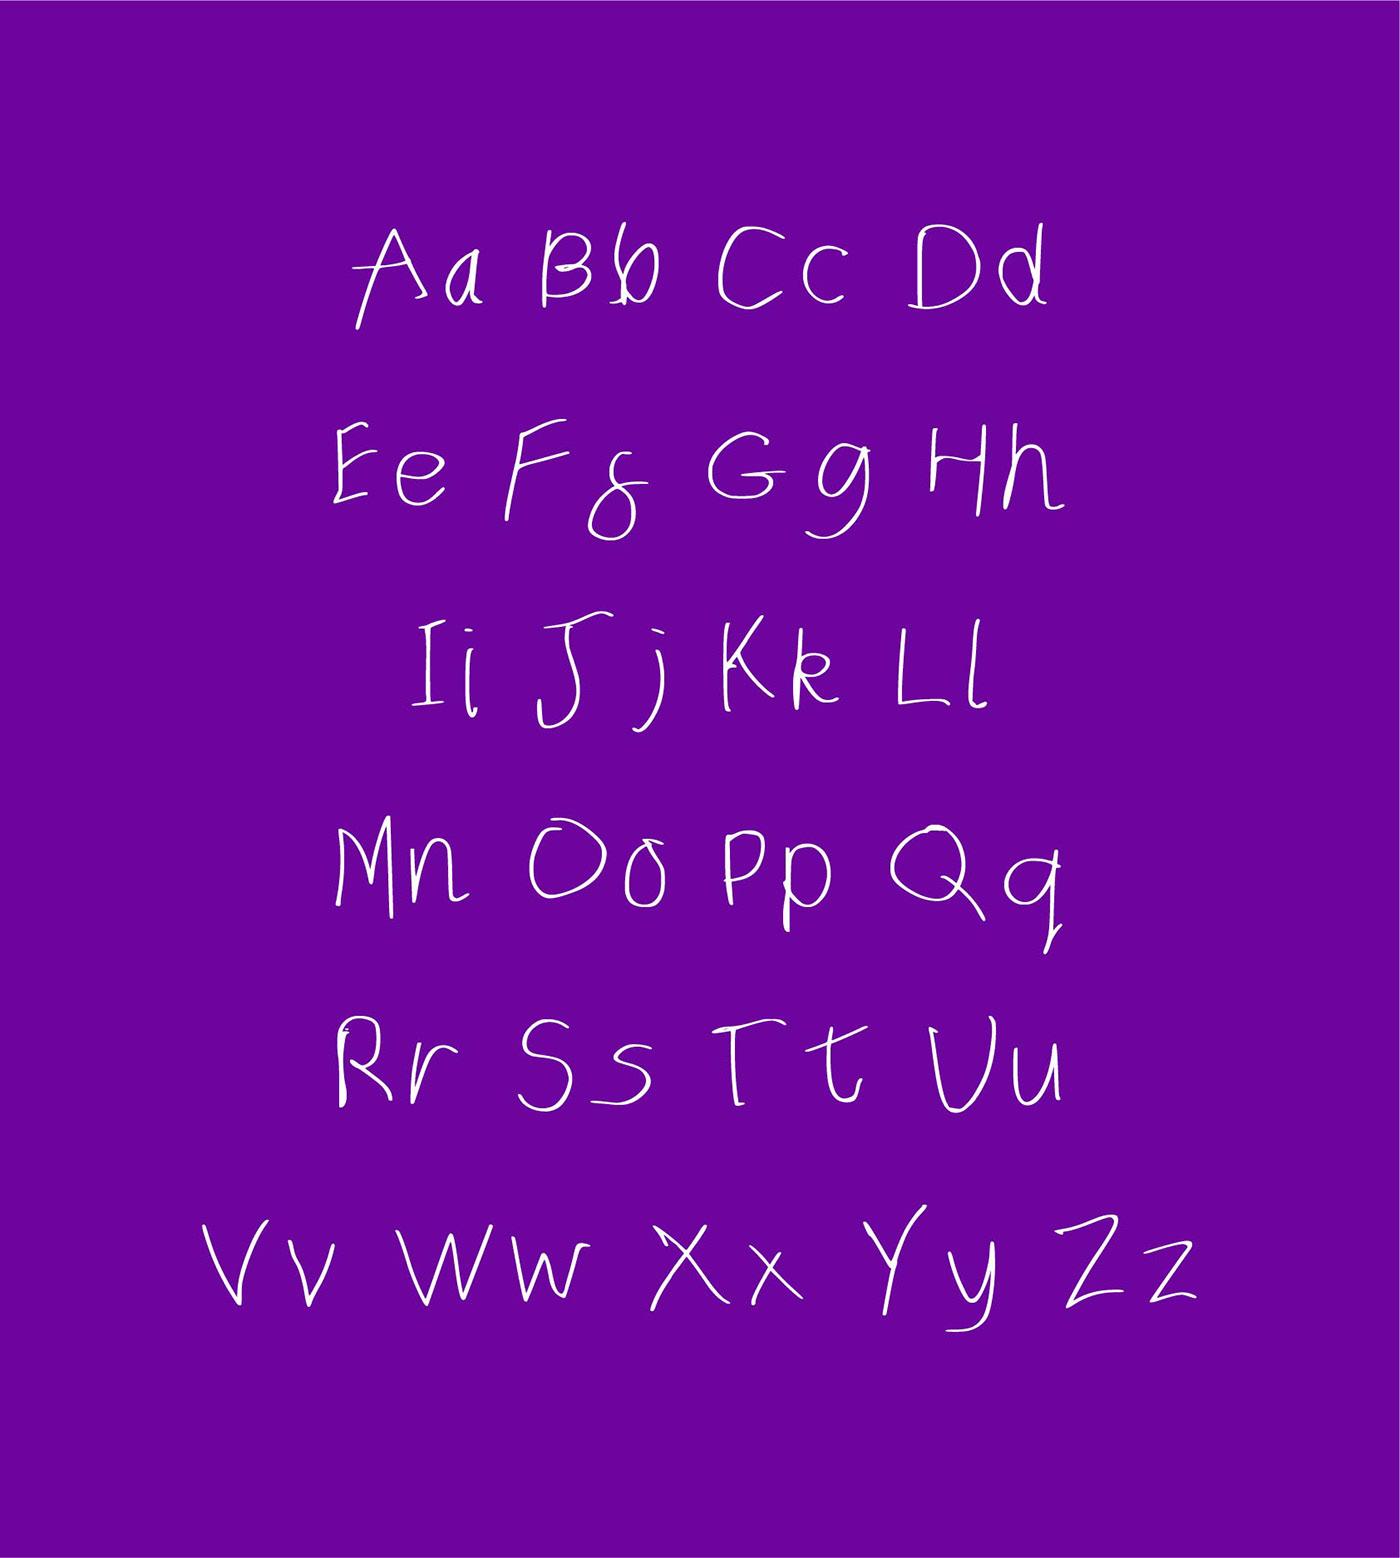 Free font,free,fonts,coowini,pomaceia,appleyard